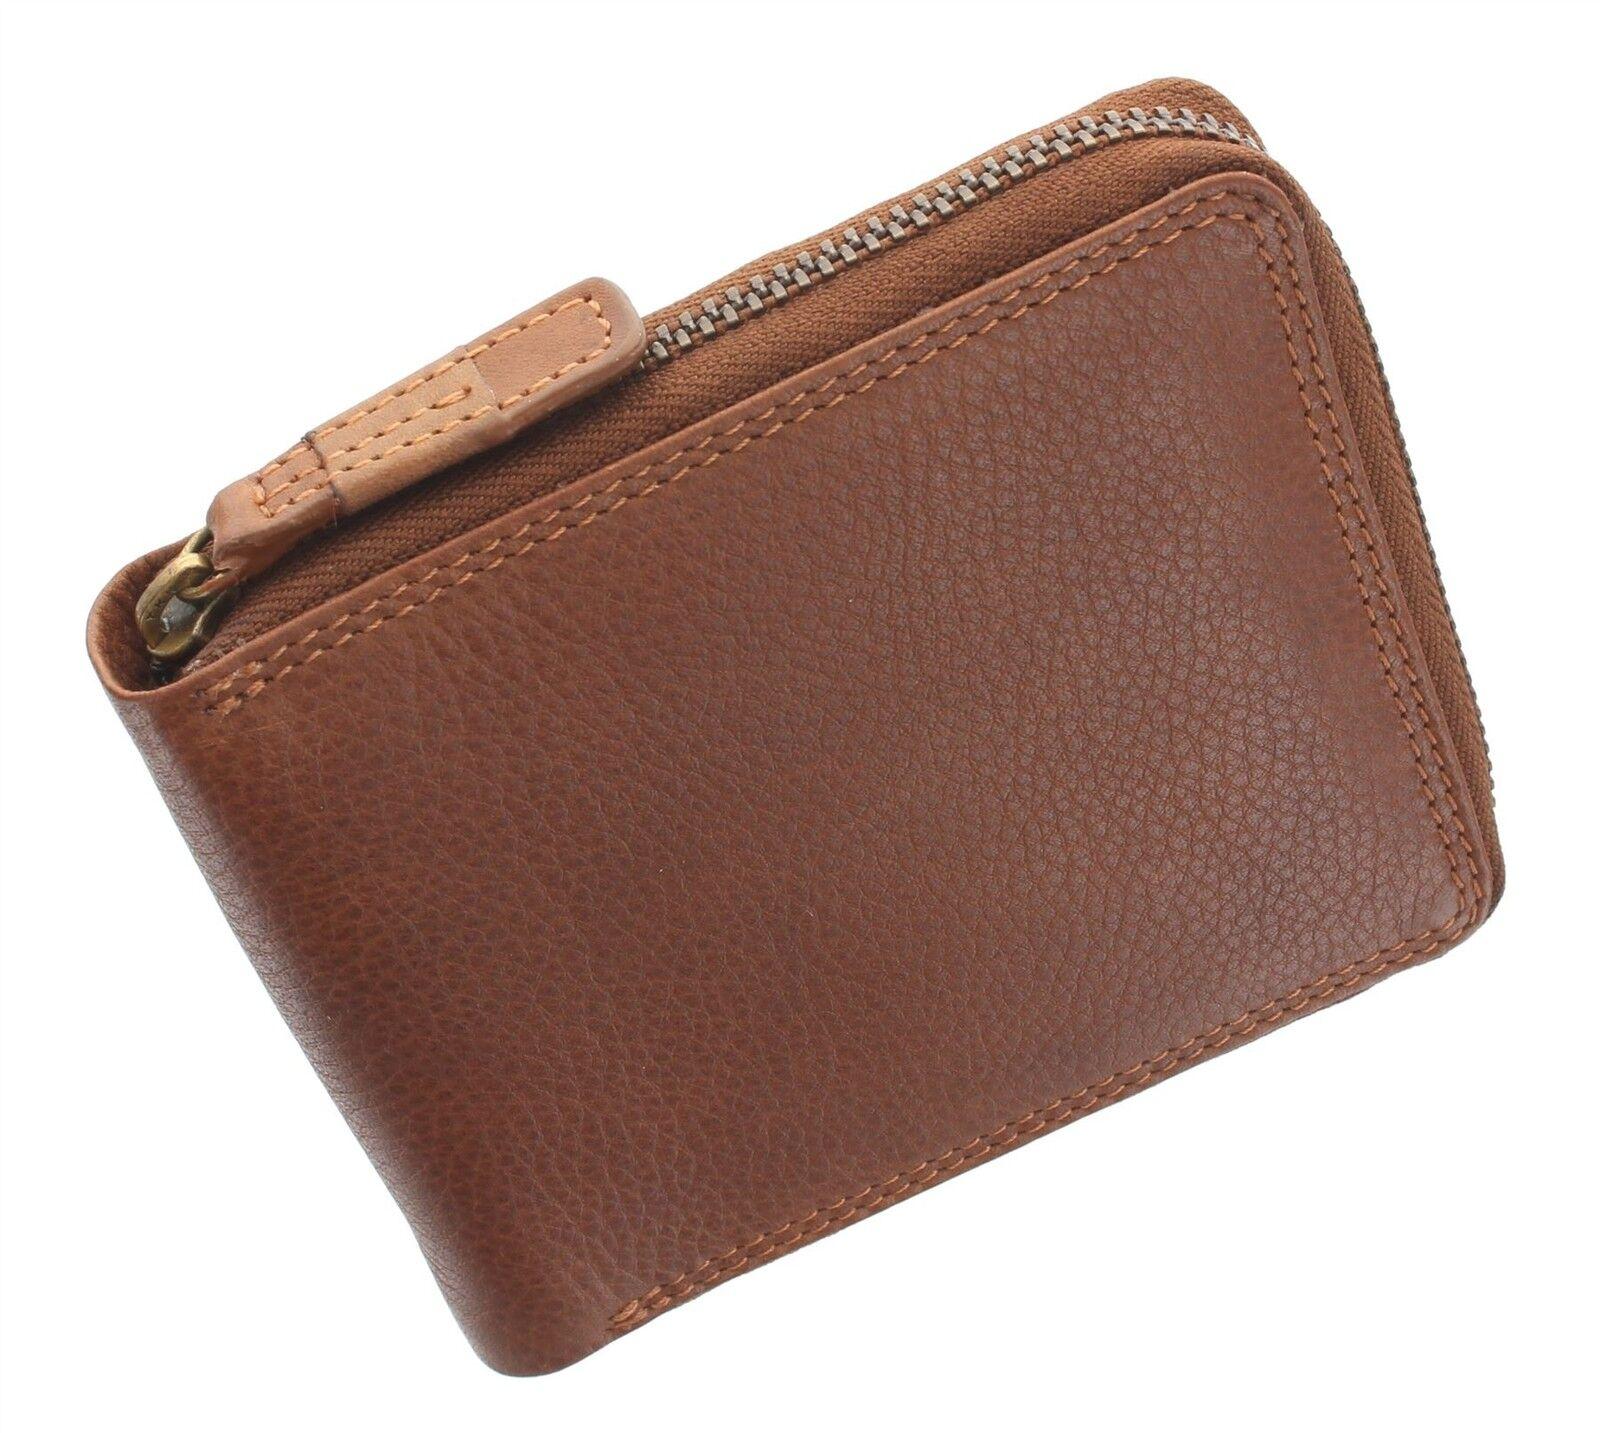 Visconti Darwin Collection HAWKING Leather Zip Round Wallet RFID blocking DRW31